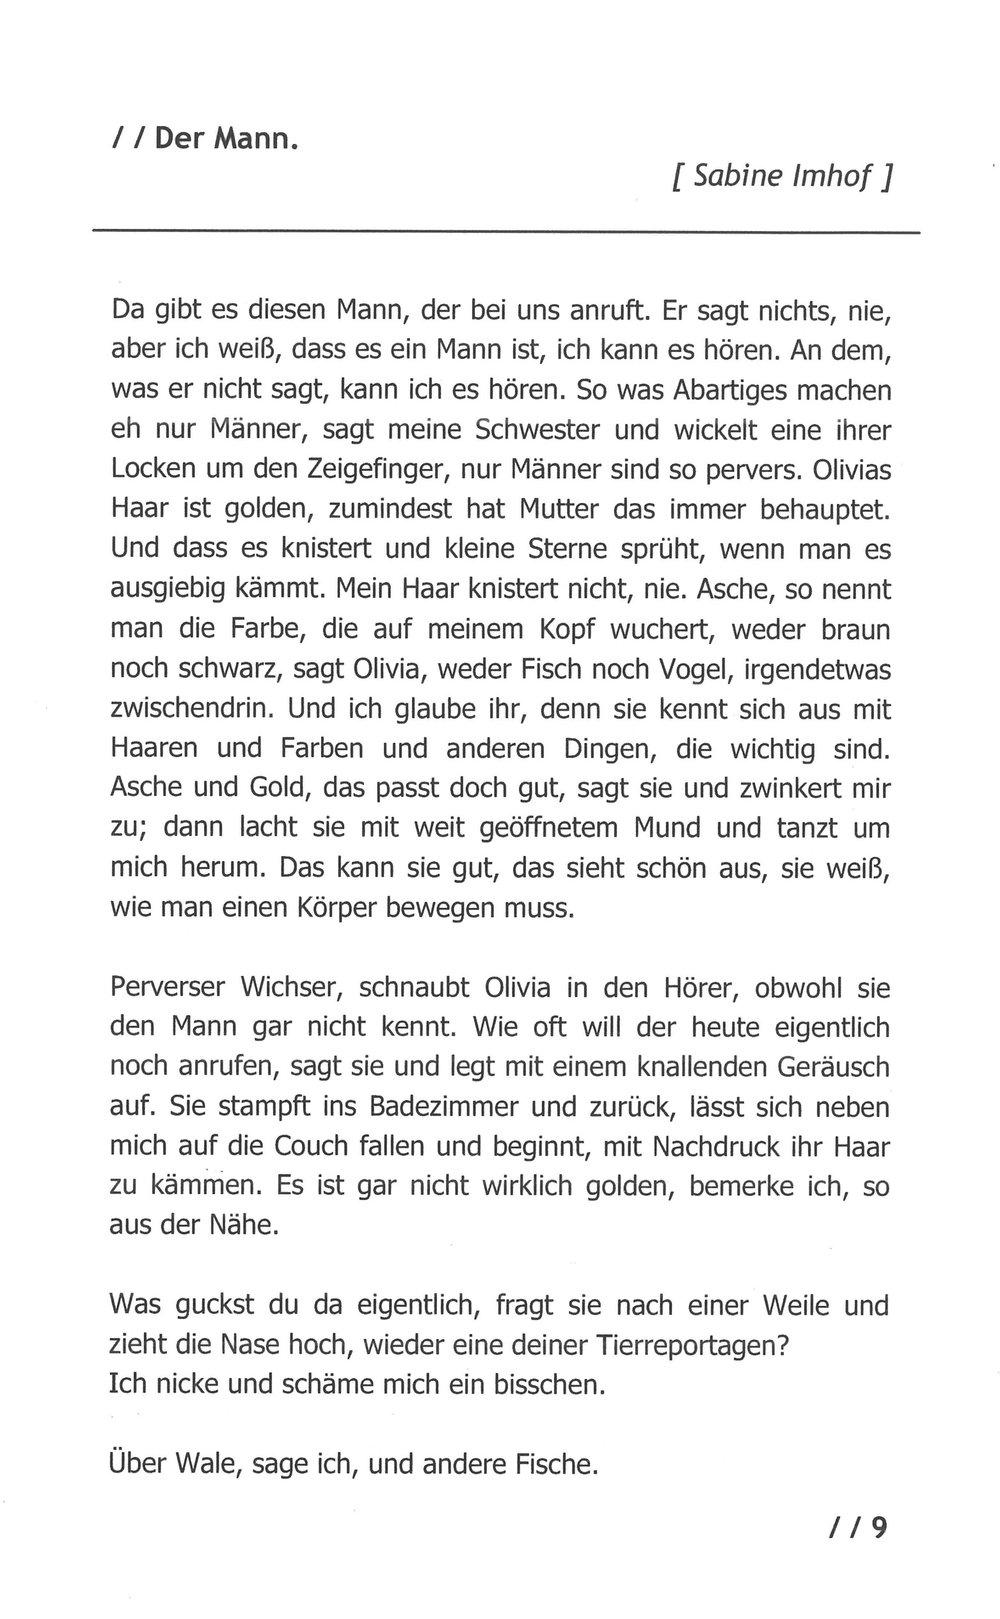 Sprachrausch_1:8_mini.jpg